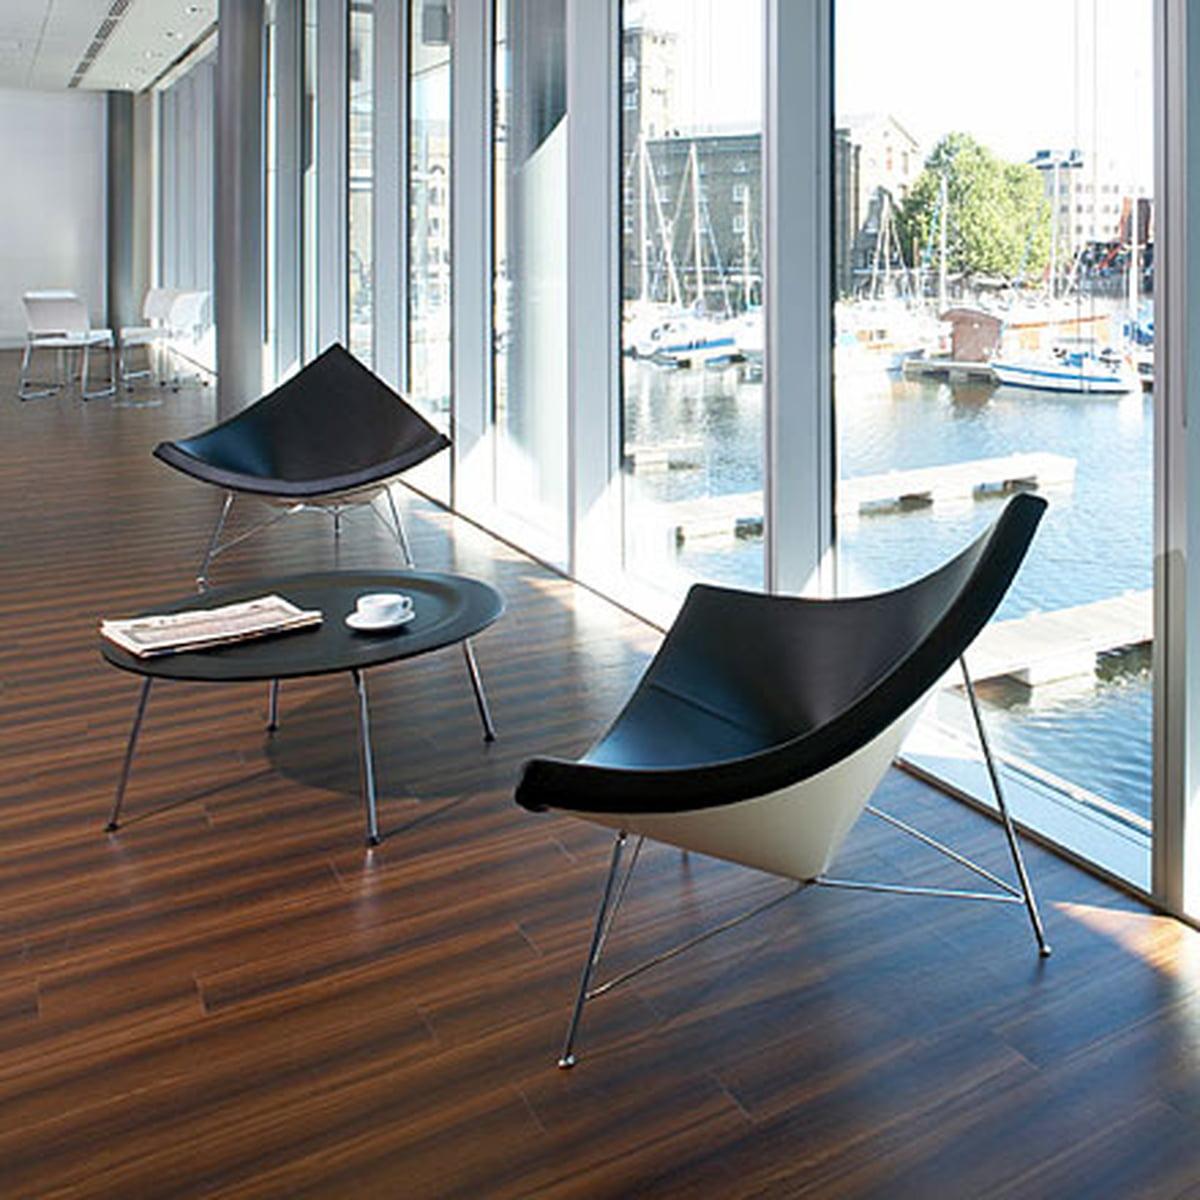 Vitra coconut chair material hopsak black